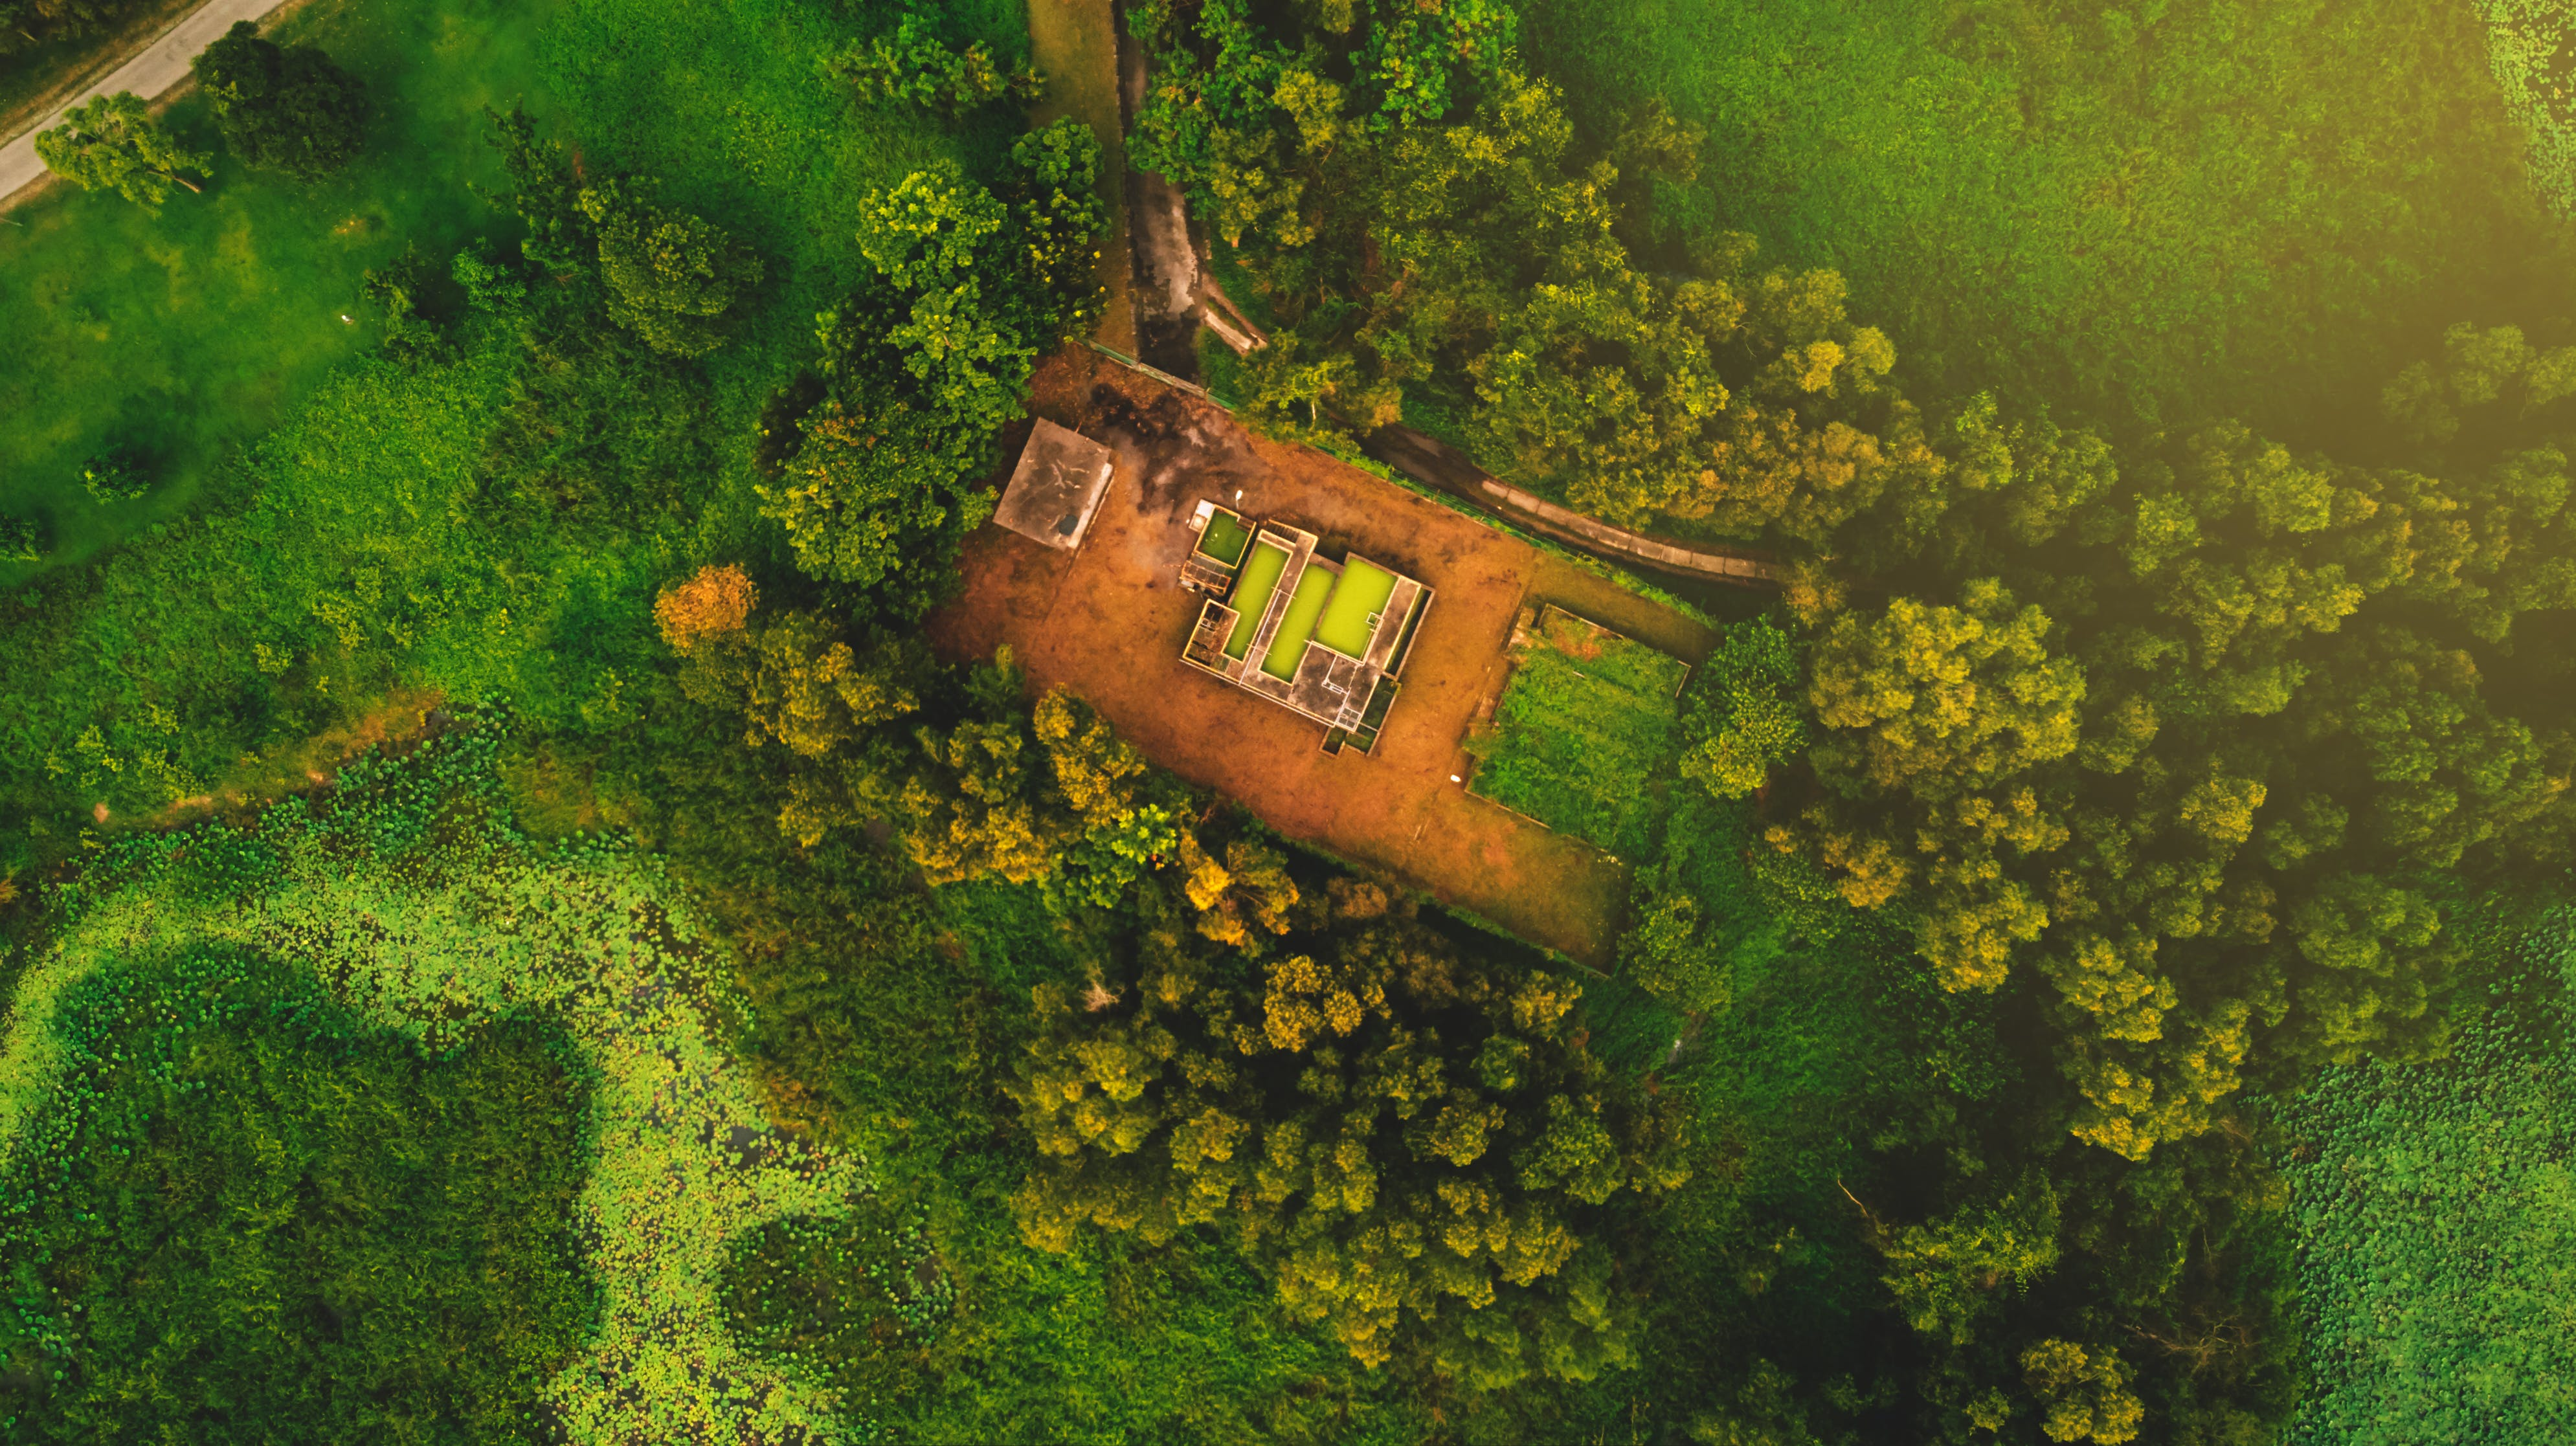 Kostenloses Stock Foto zu bäume, drohne cam, drohne erschossen, drohnenfotografie